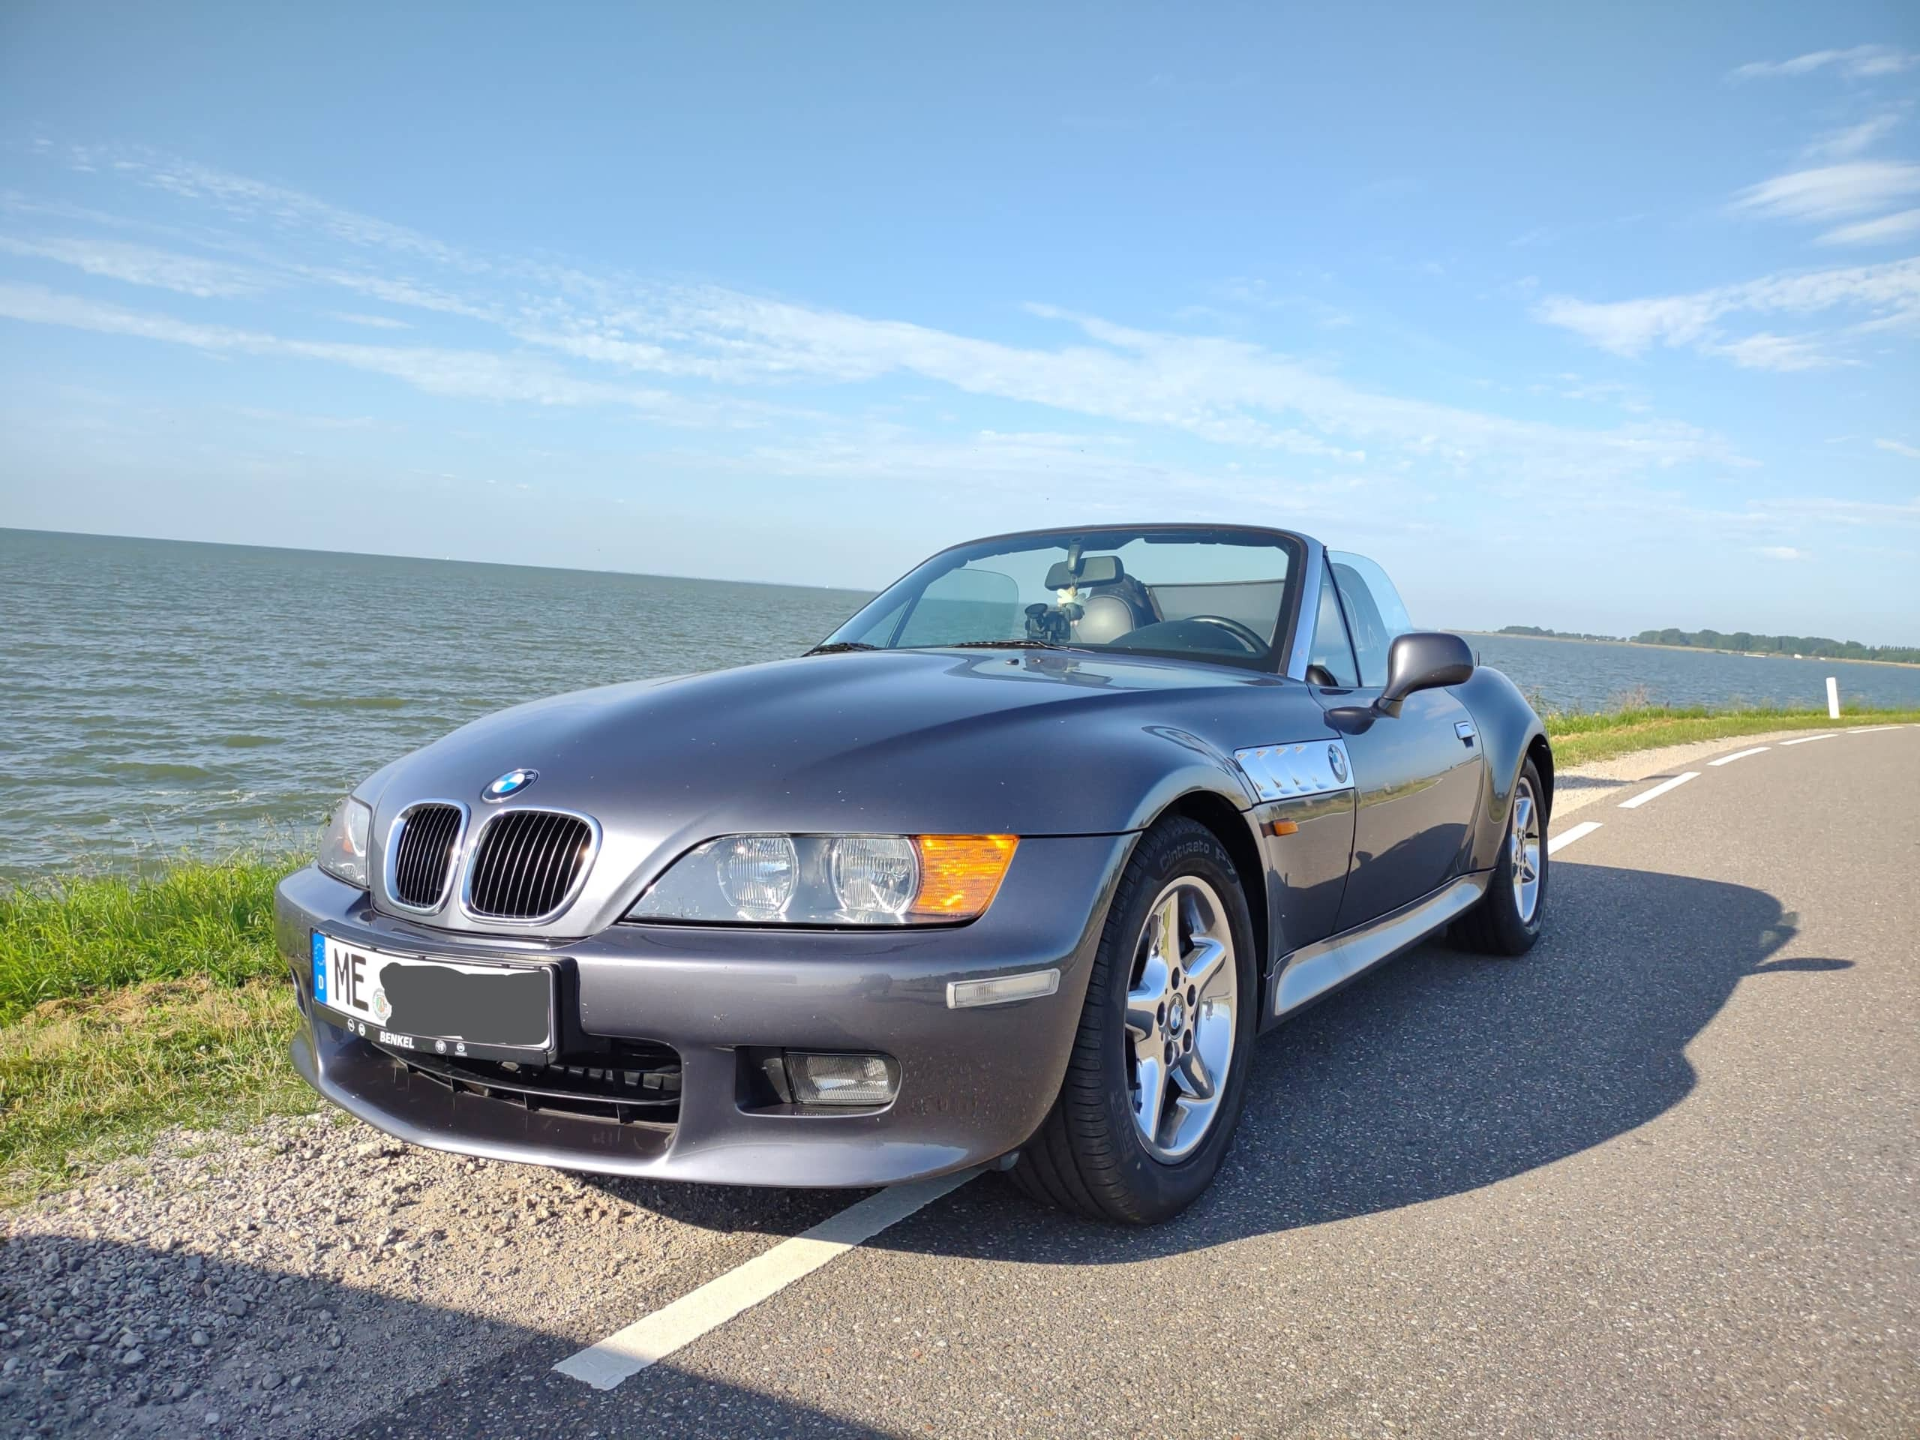 BMW_Z3_Roadster_Sechszylinder